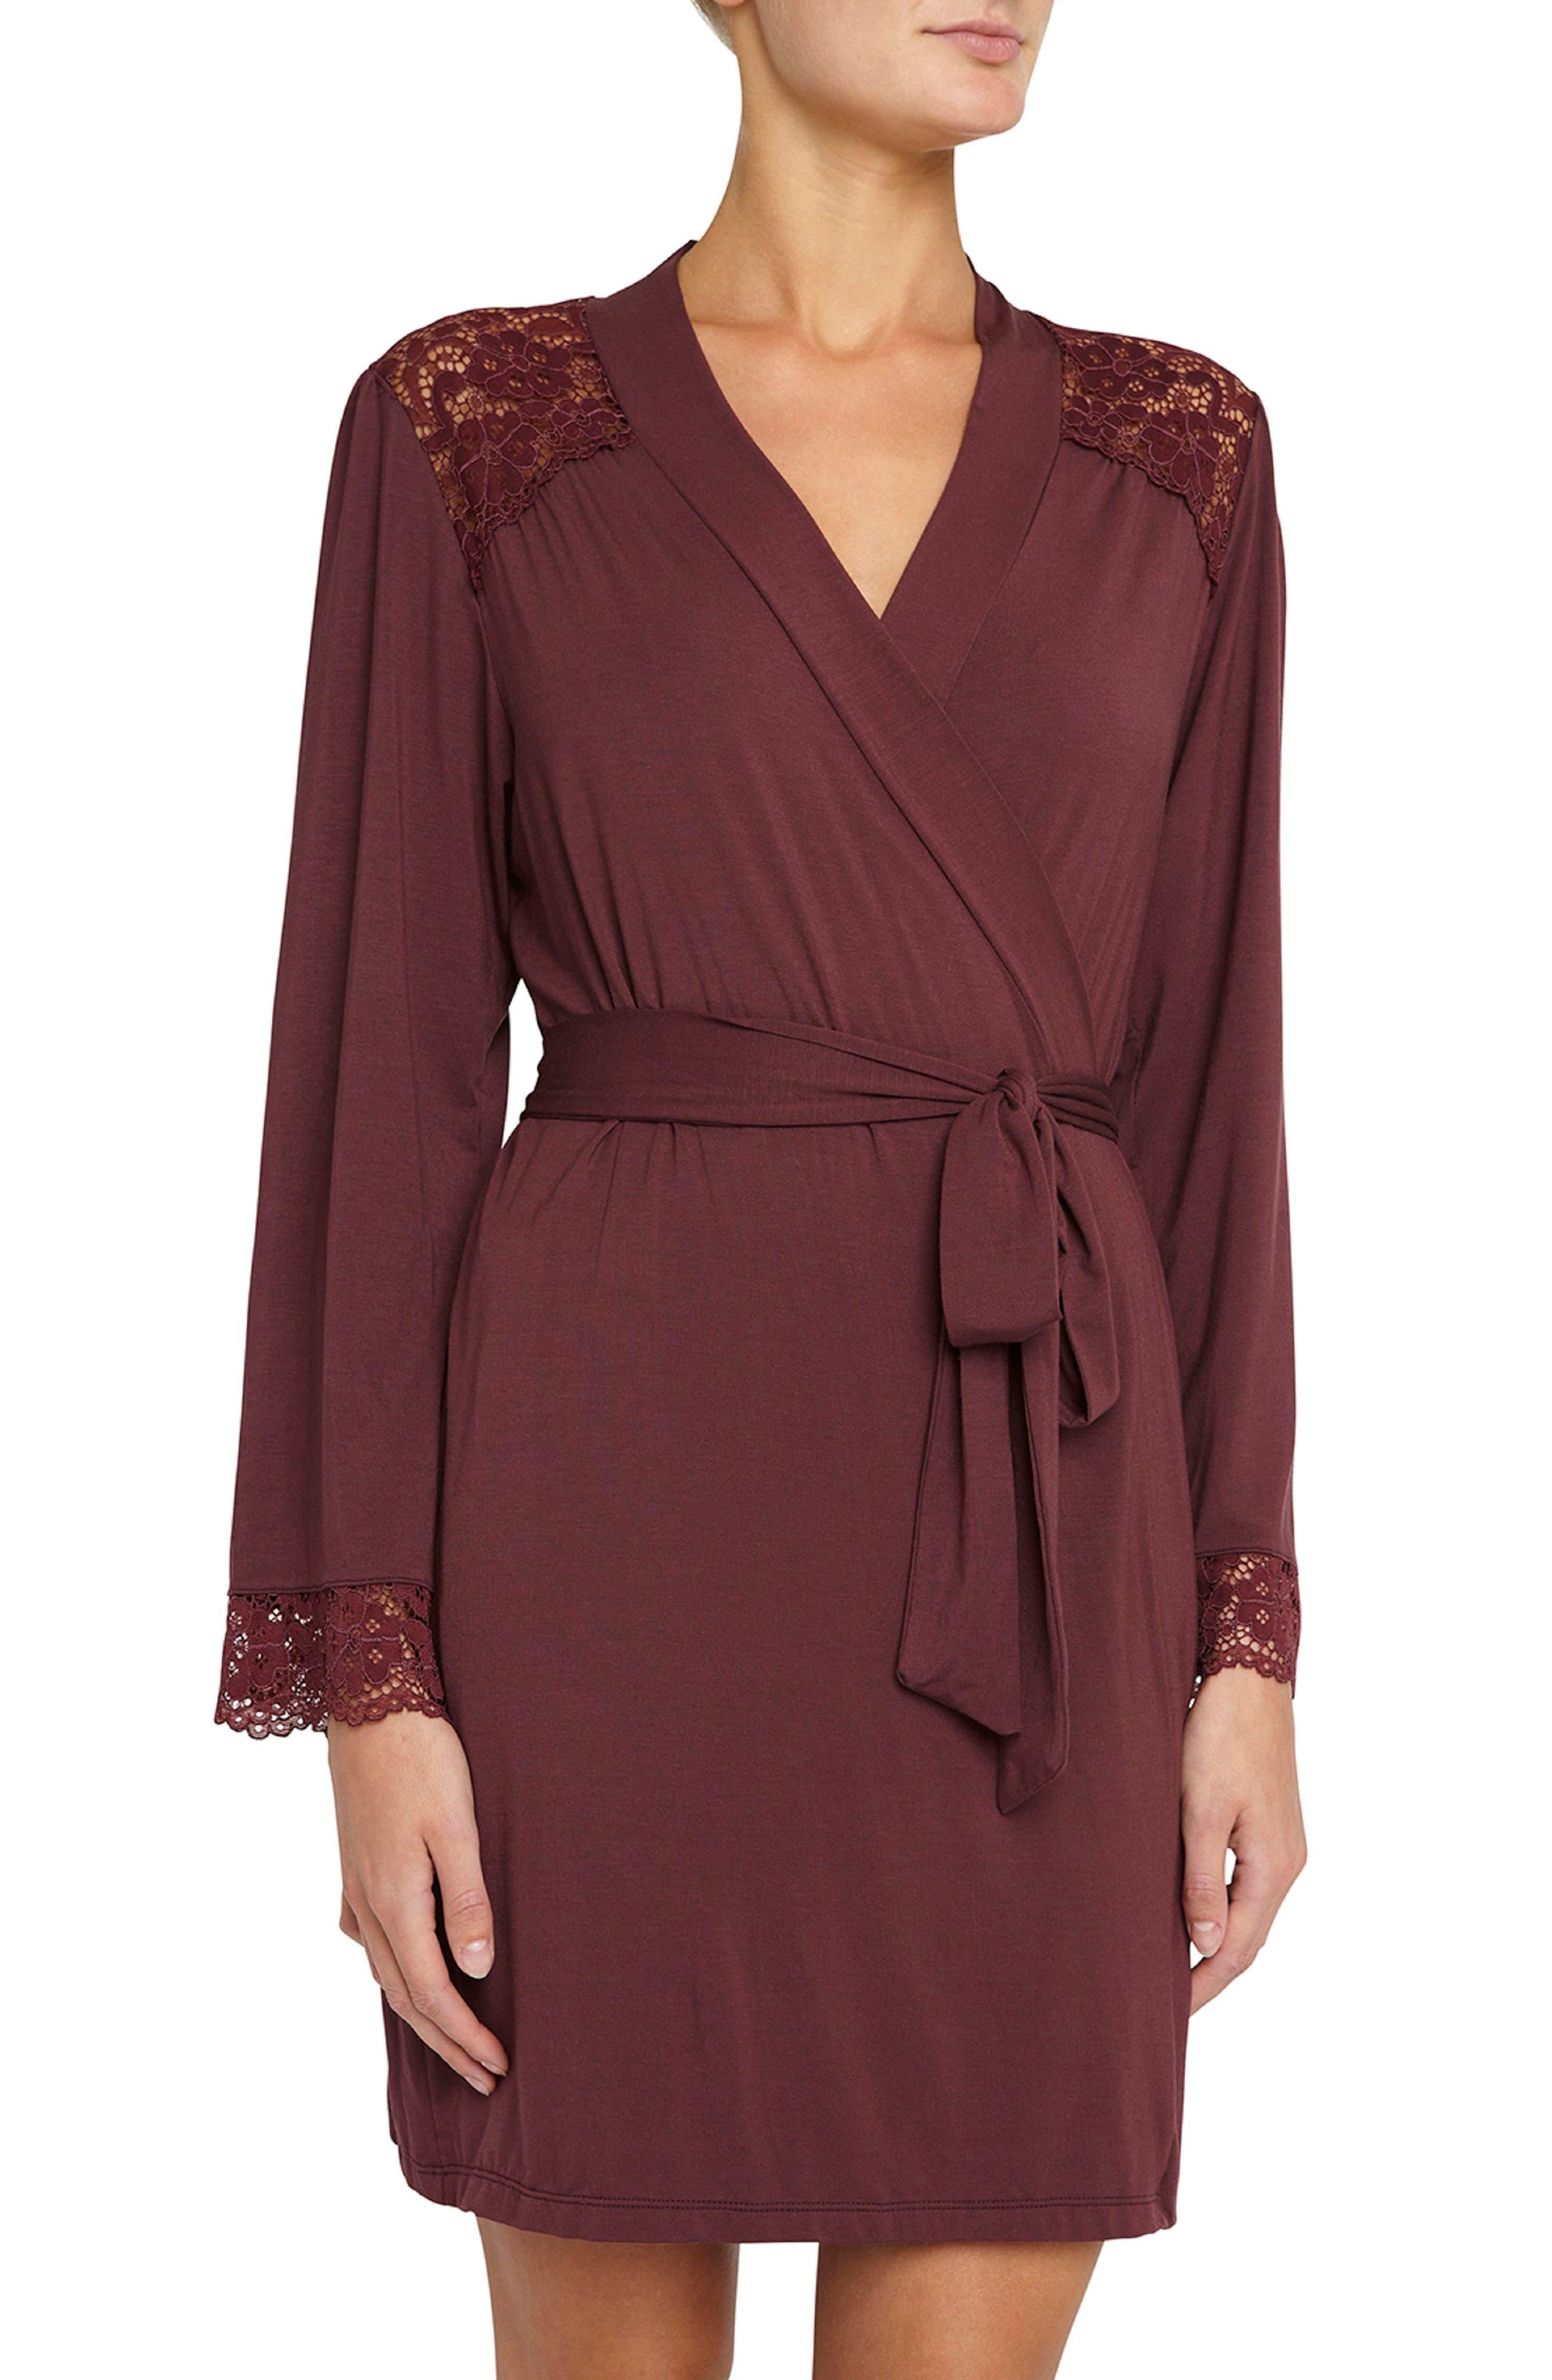 Vineland Wine Lila Short Robe,                         Main,                         color, 930